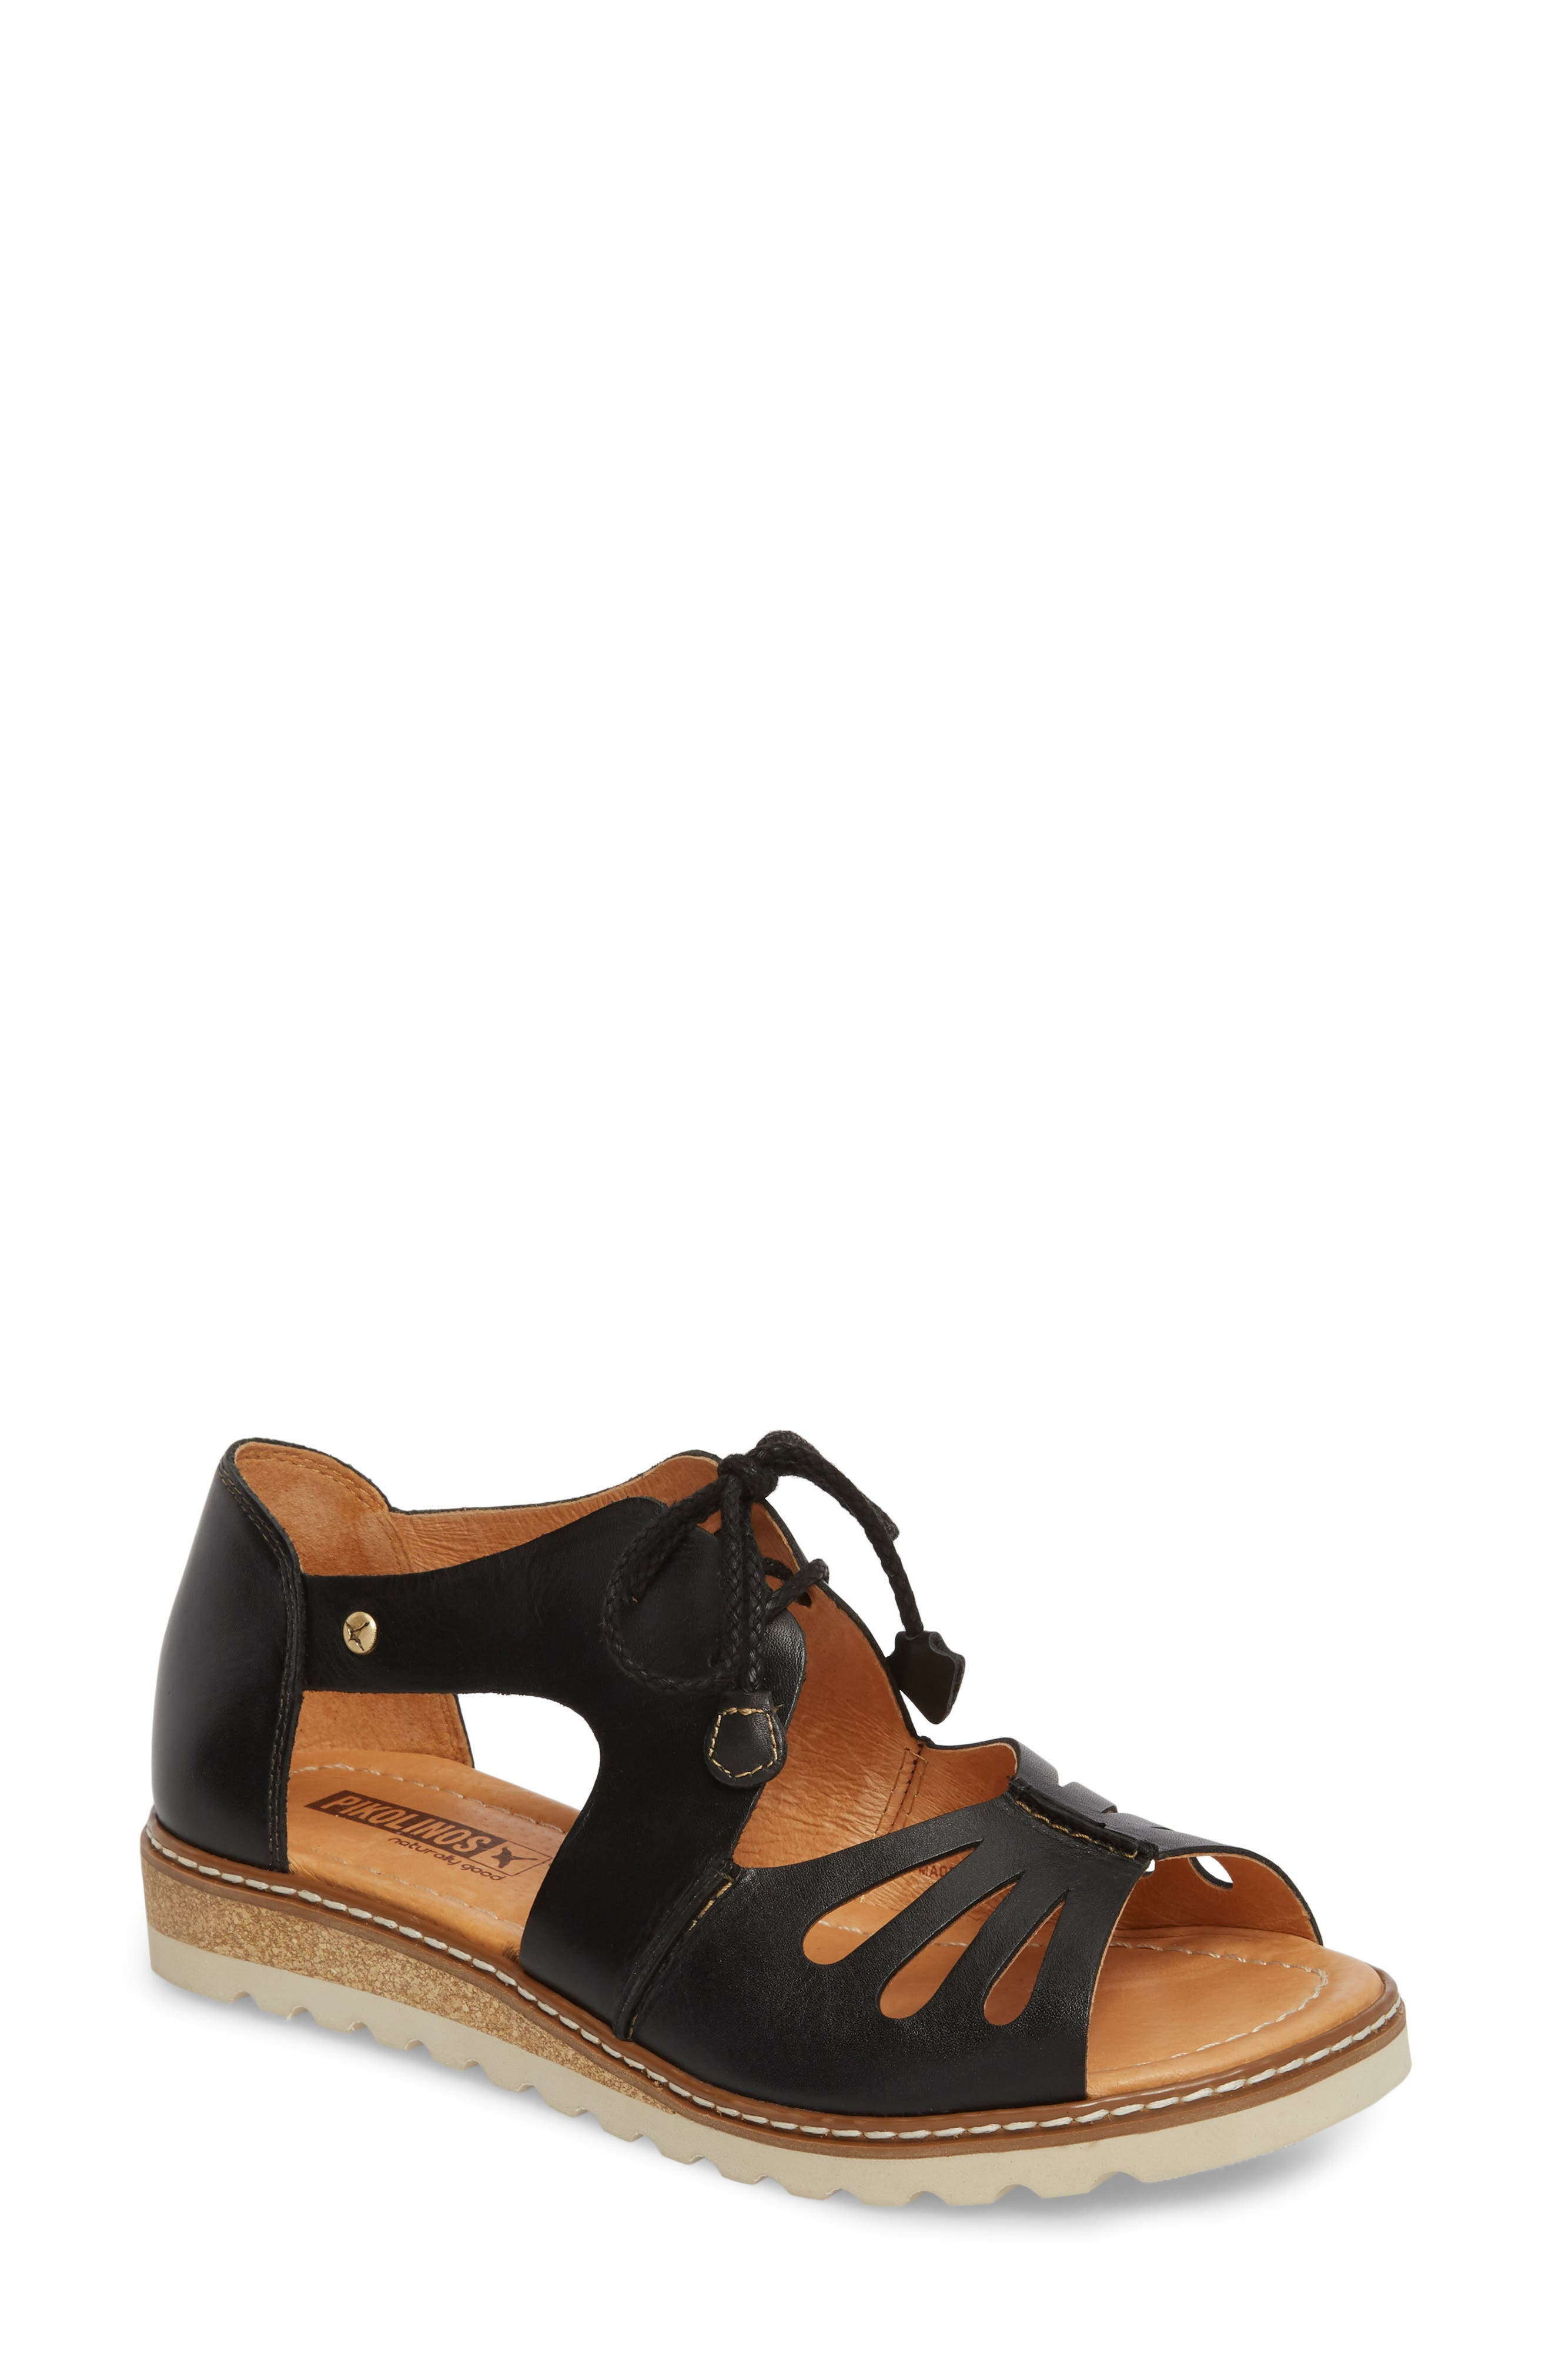 Alcudia Lace-Up Sandal,                             Main thumbnail 1, color,                             BLACK LEATHER